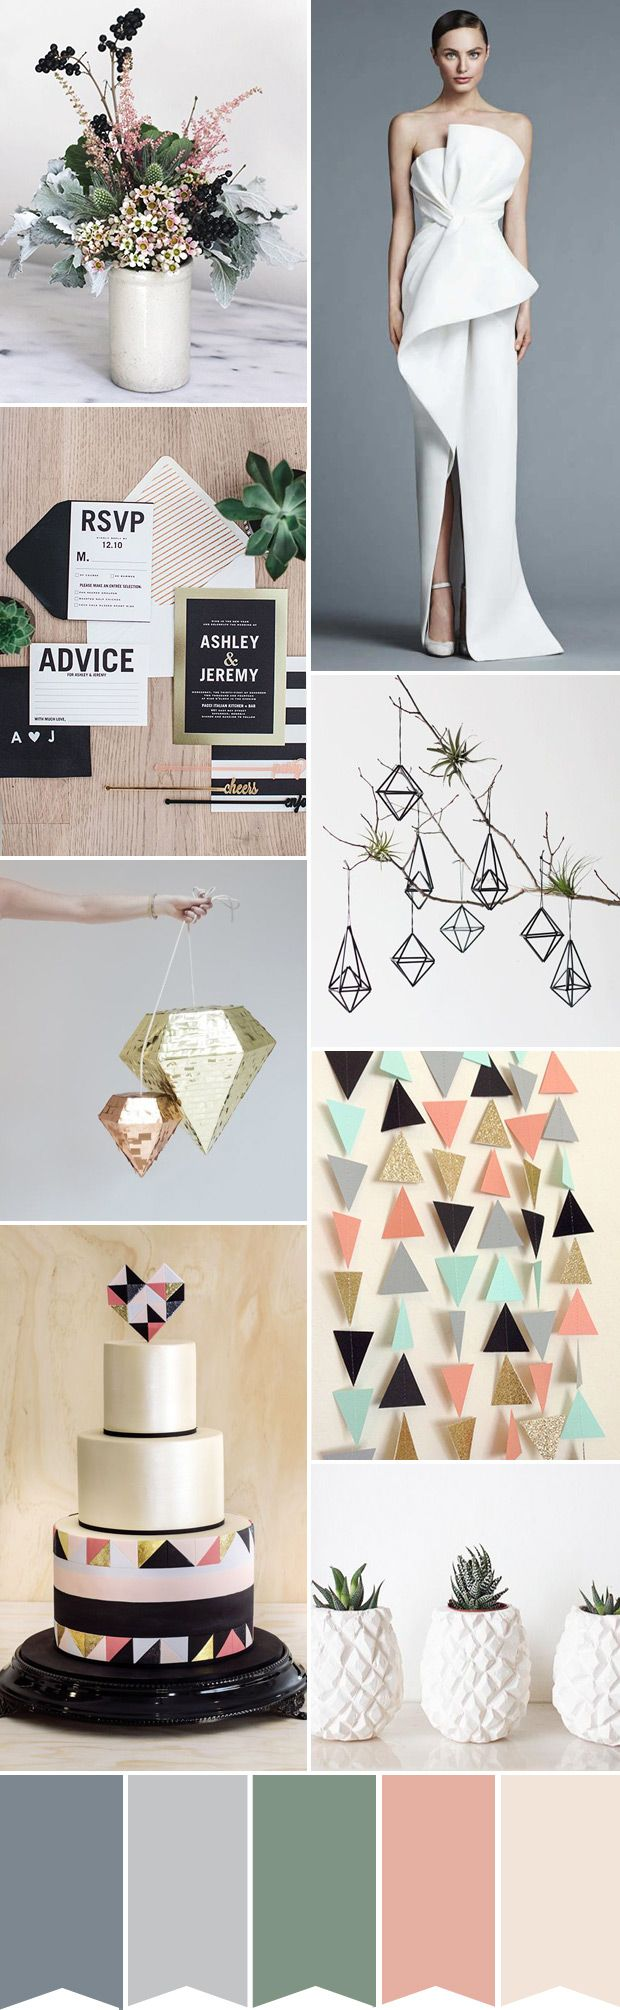 Modern Geometric Wedding Color Palette | www.onefabday.com